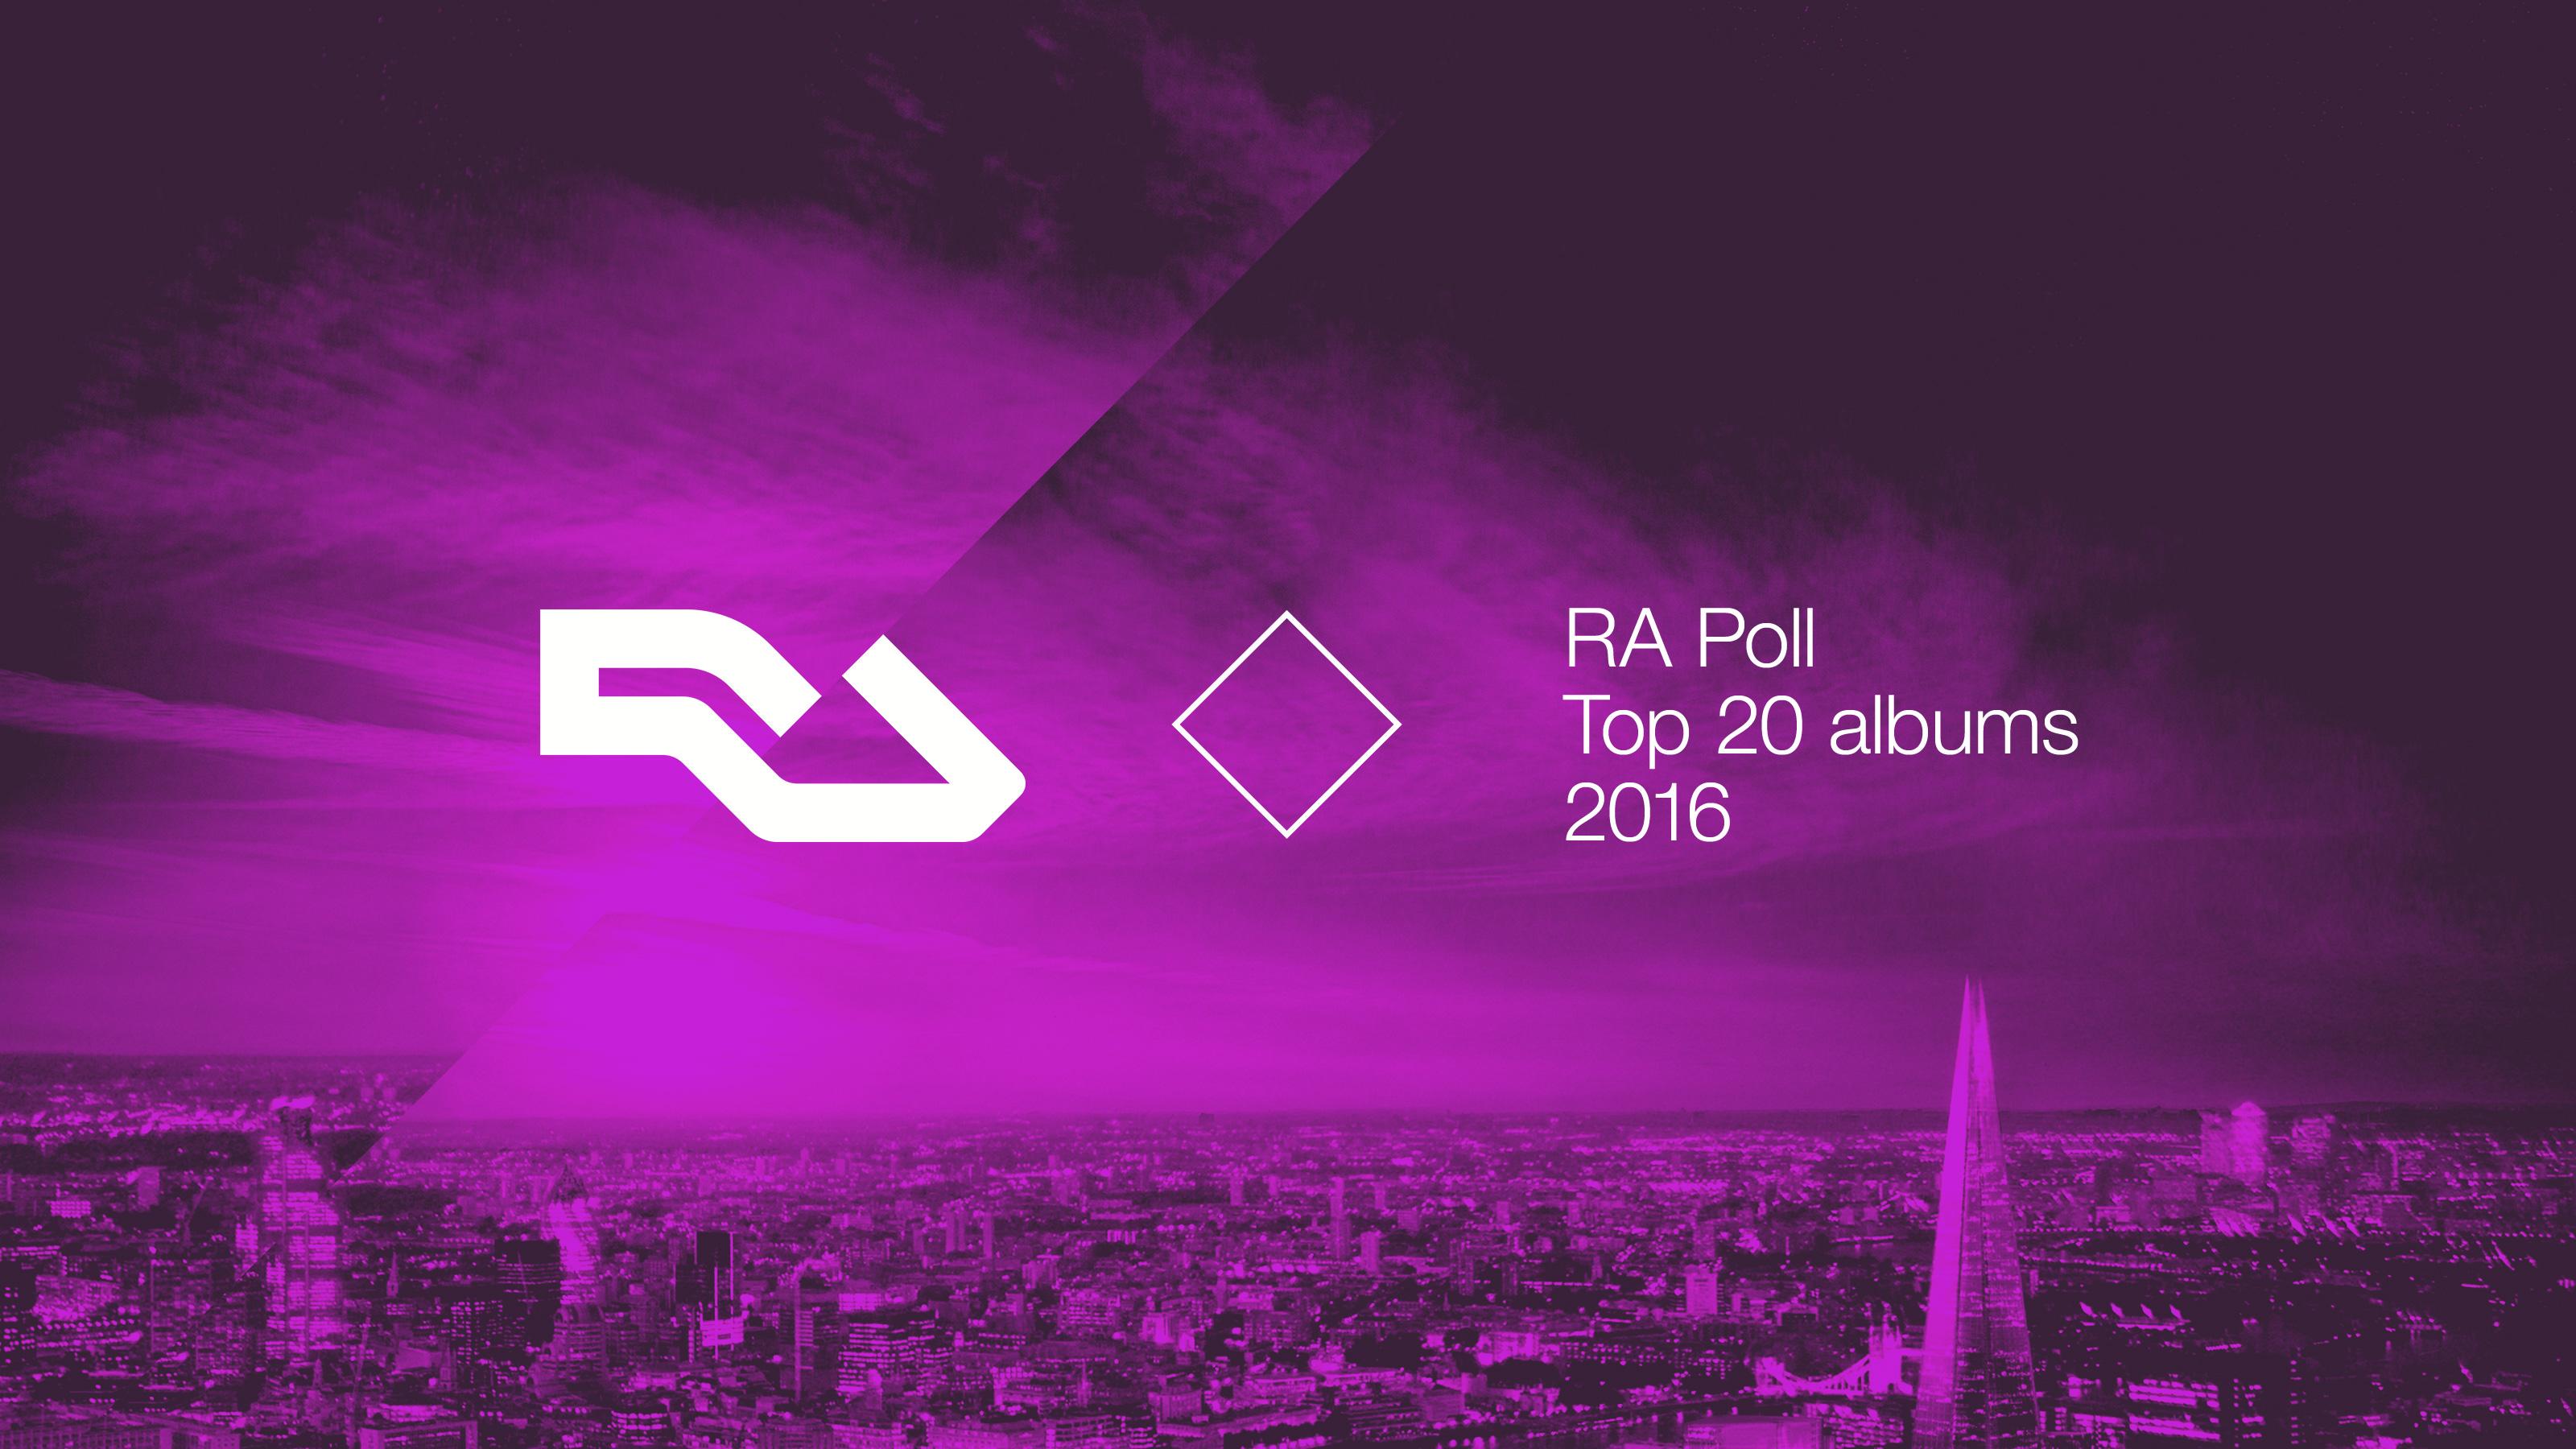 RA Poll: Top 20 albums of 2016